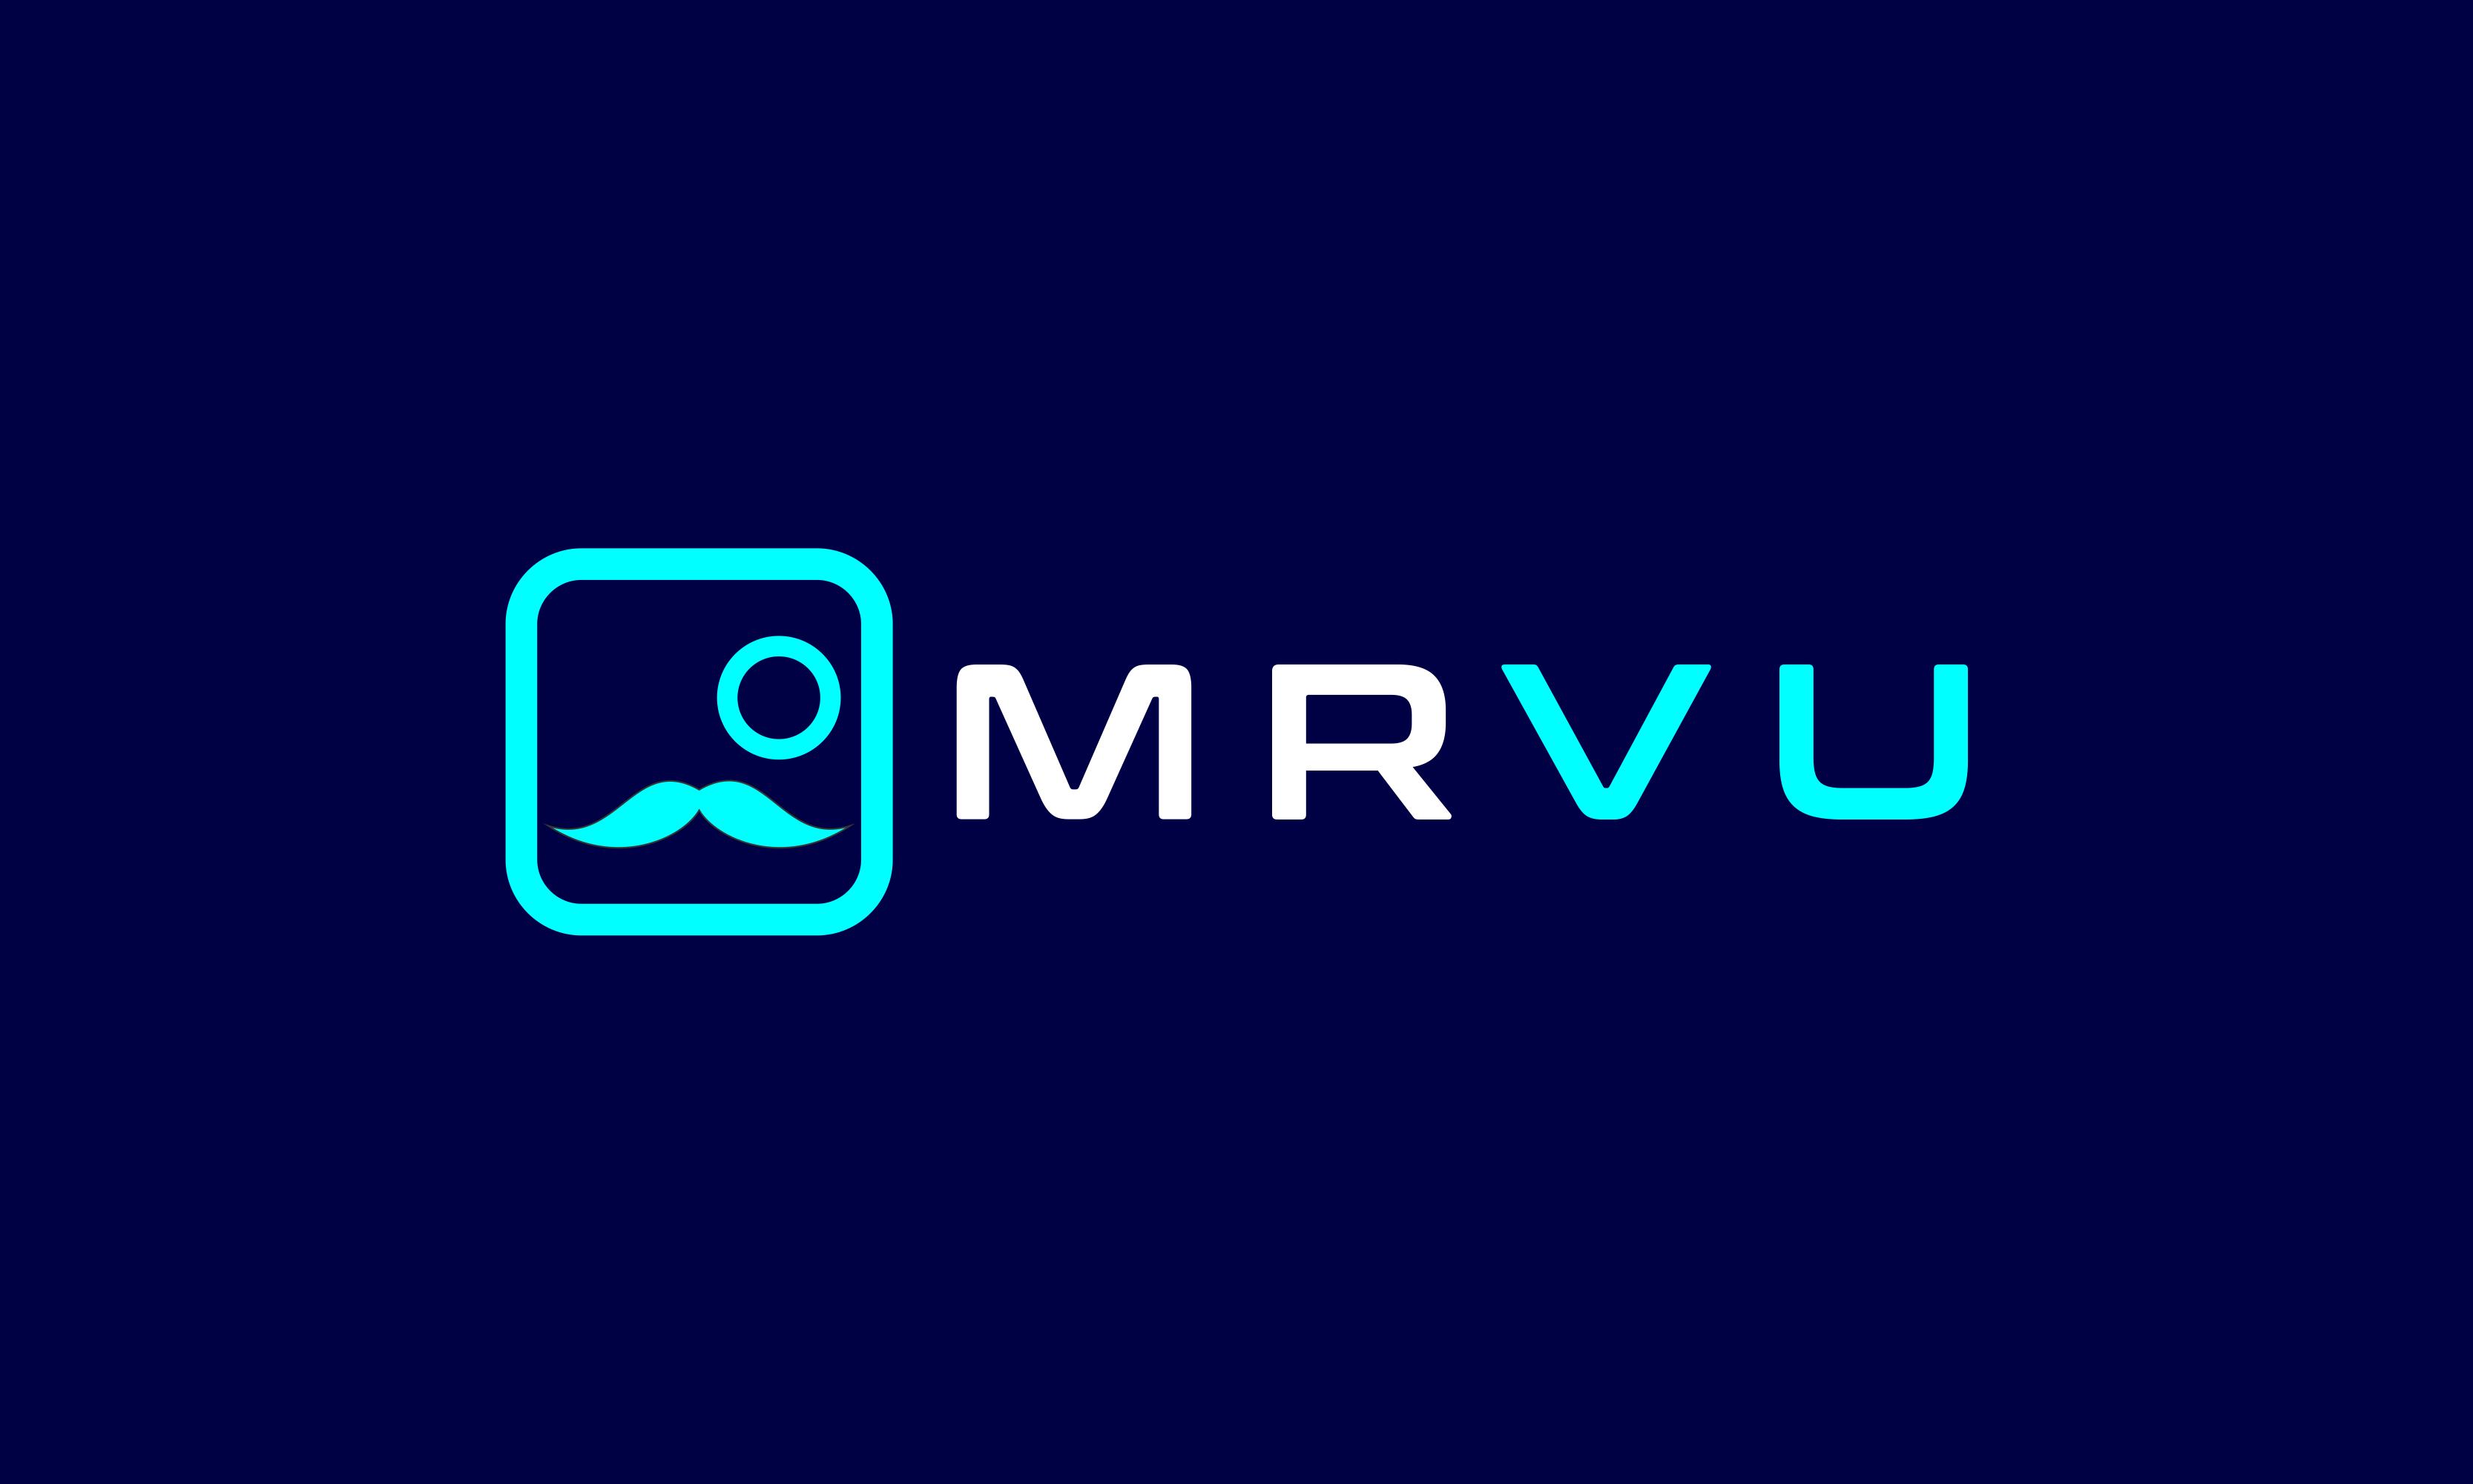 MRVu logo